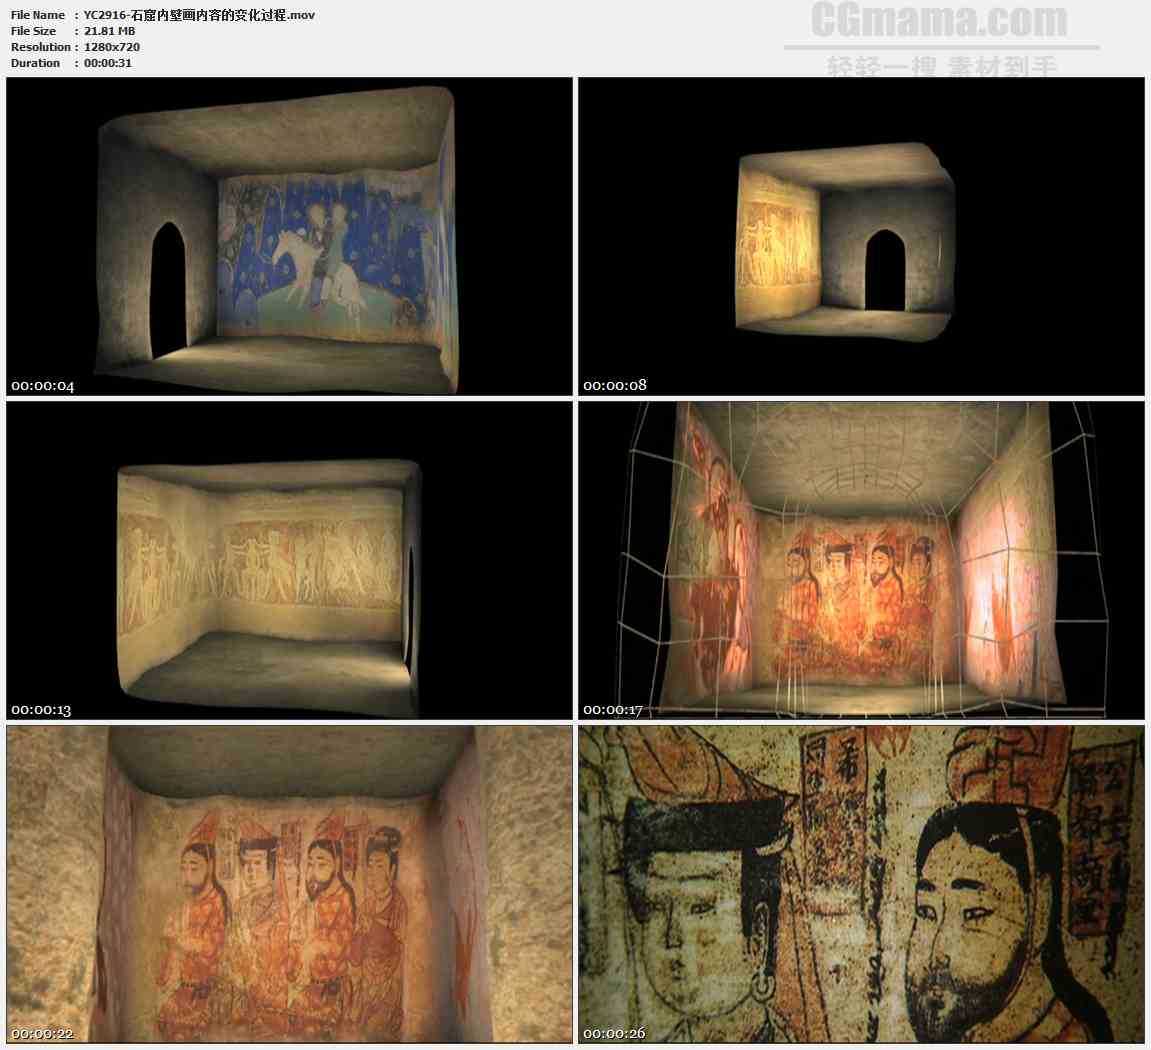 YC2916-石窟内壁画内容的变化过程高清实拍视频素材